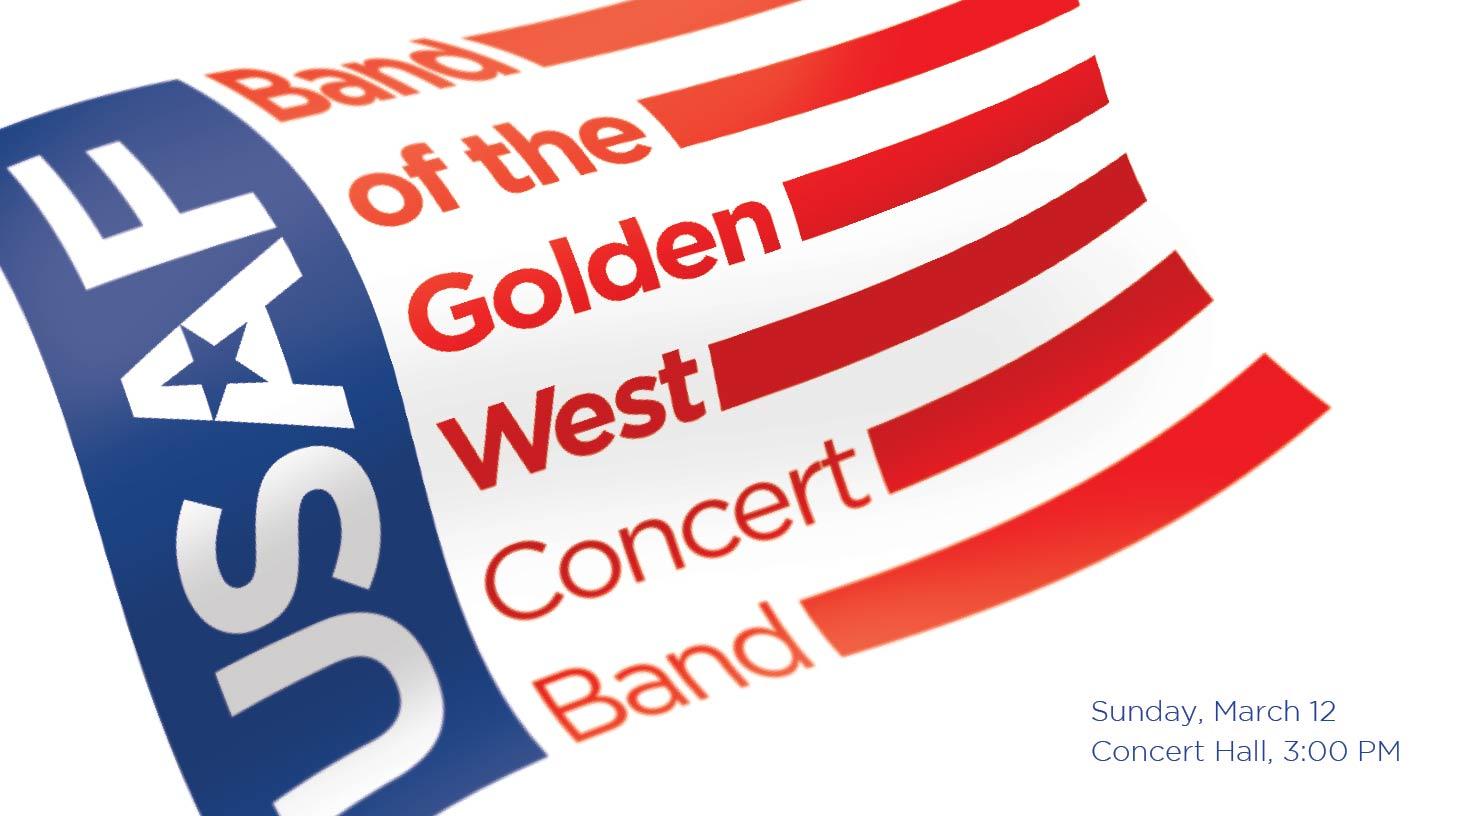 USAF Band Of The Golden West Concert Band